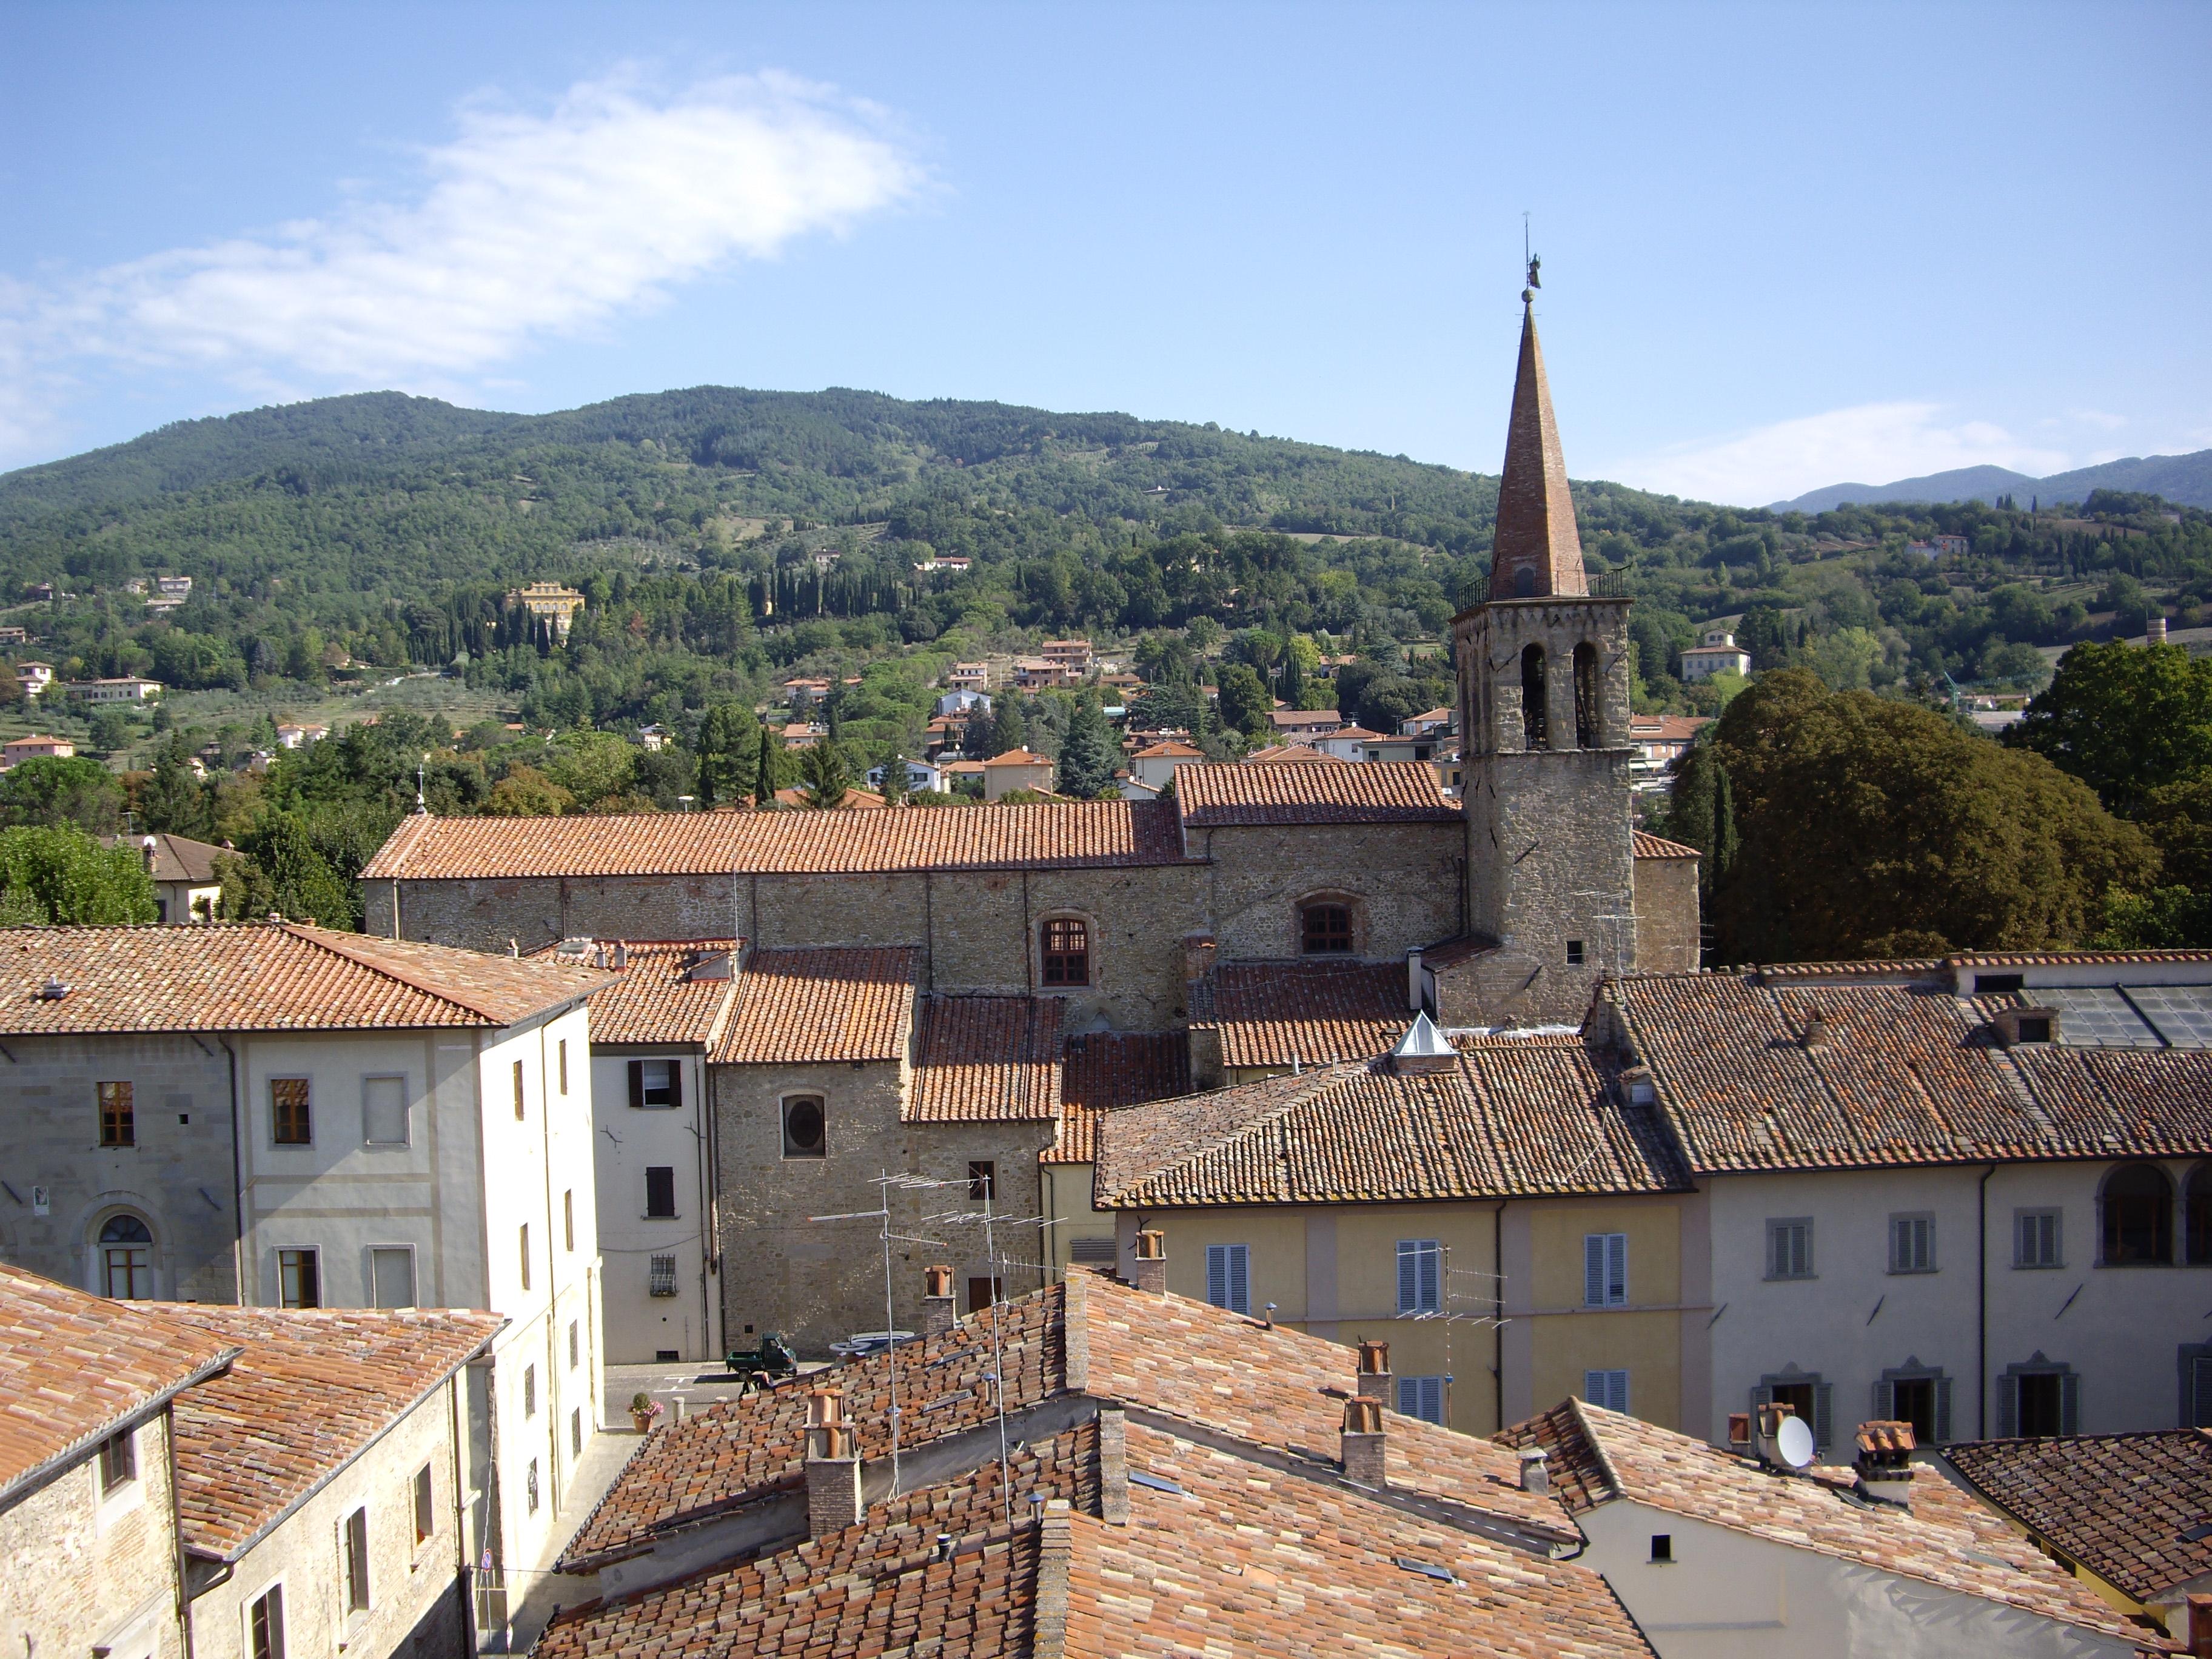 Sansepolcro Italy  city photos : Sansepolcro roofs with church steeple Wikimedia Commons